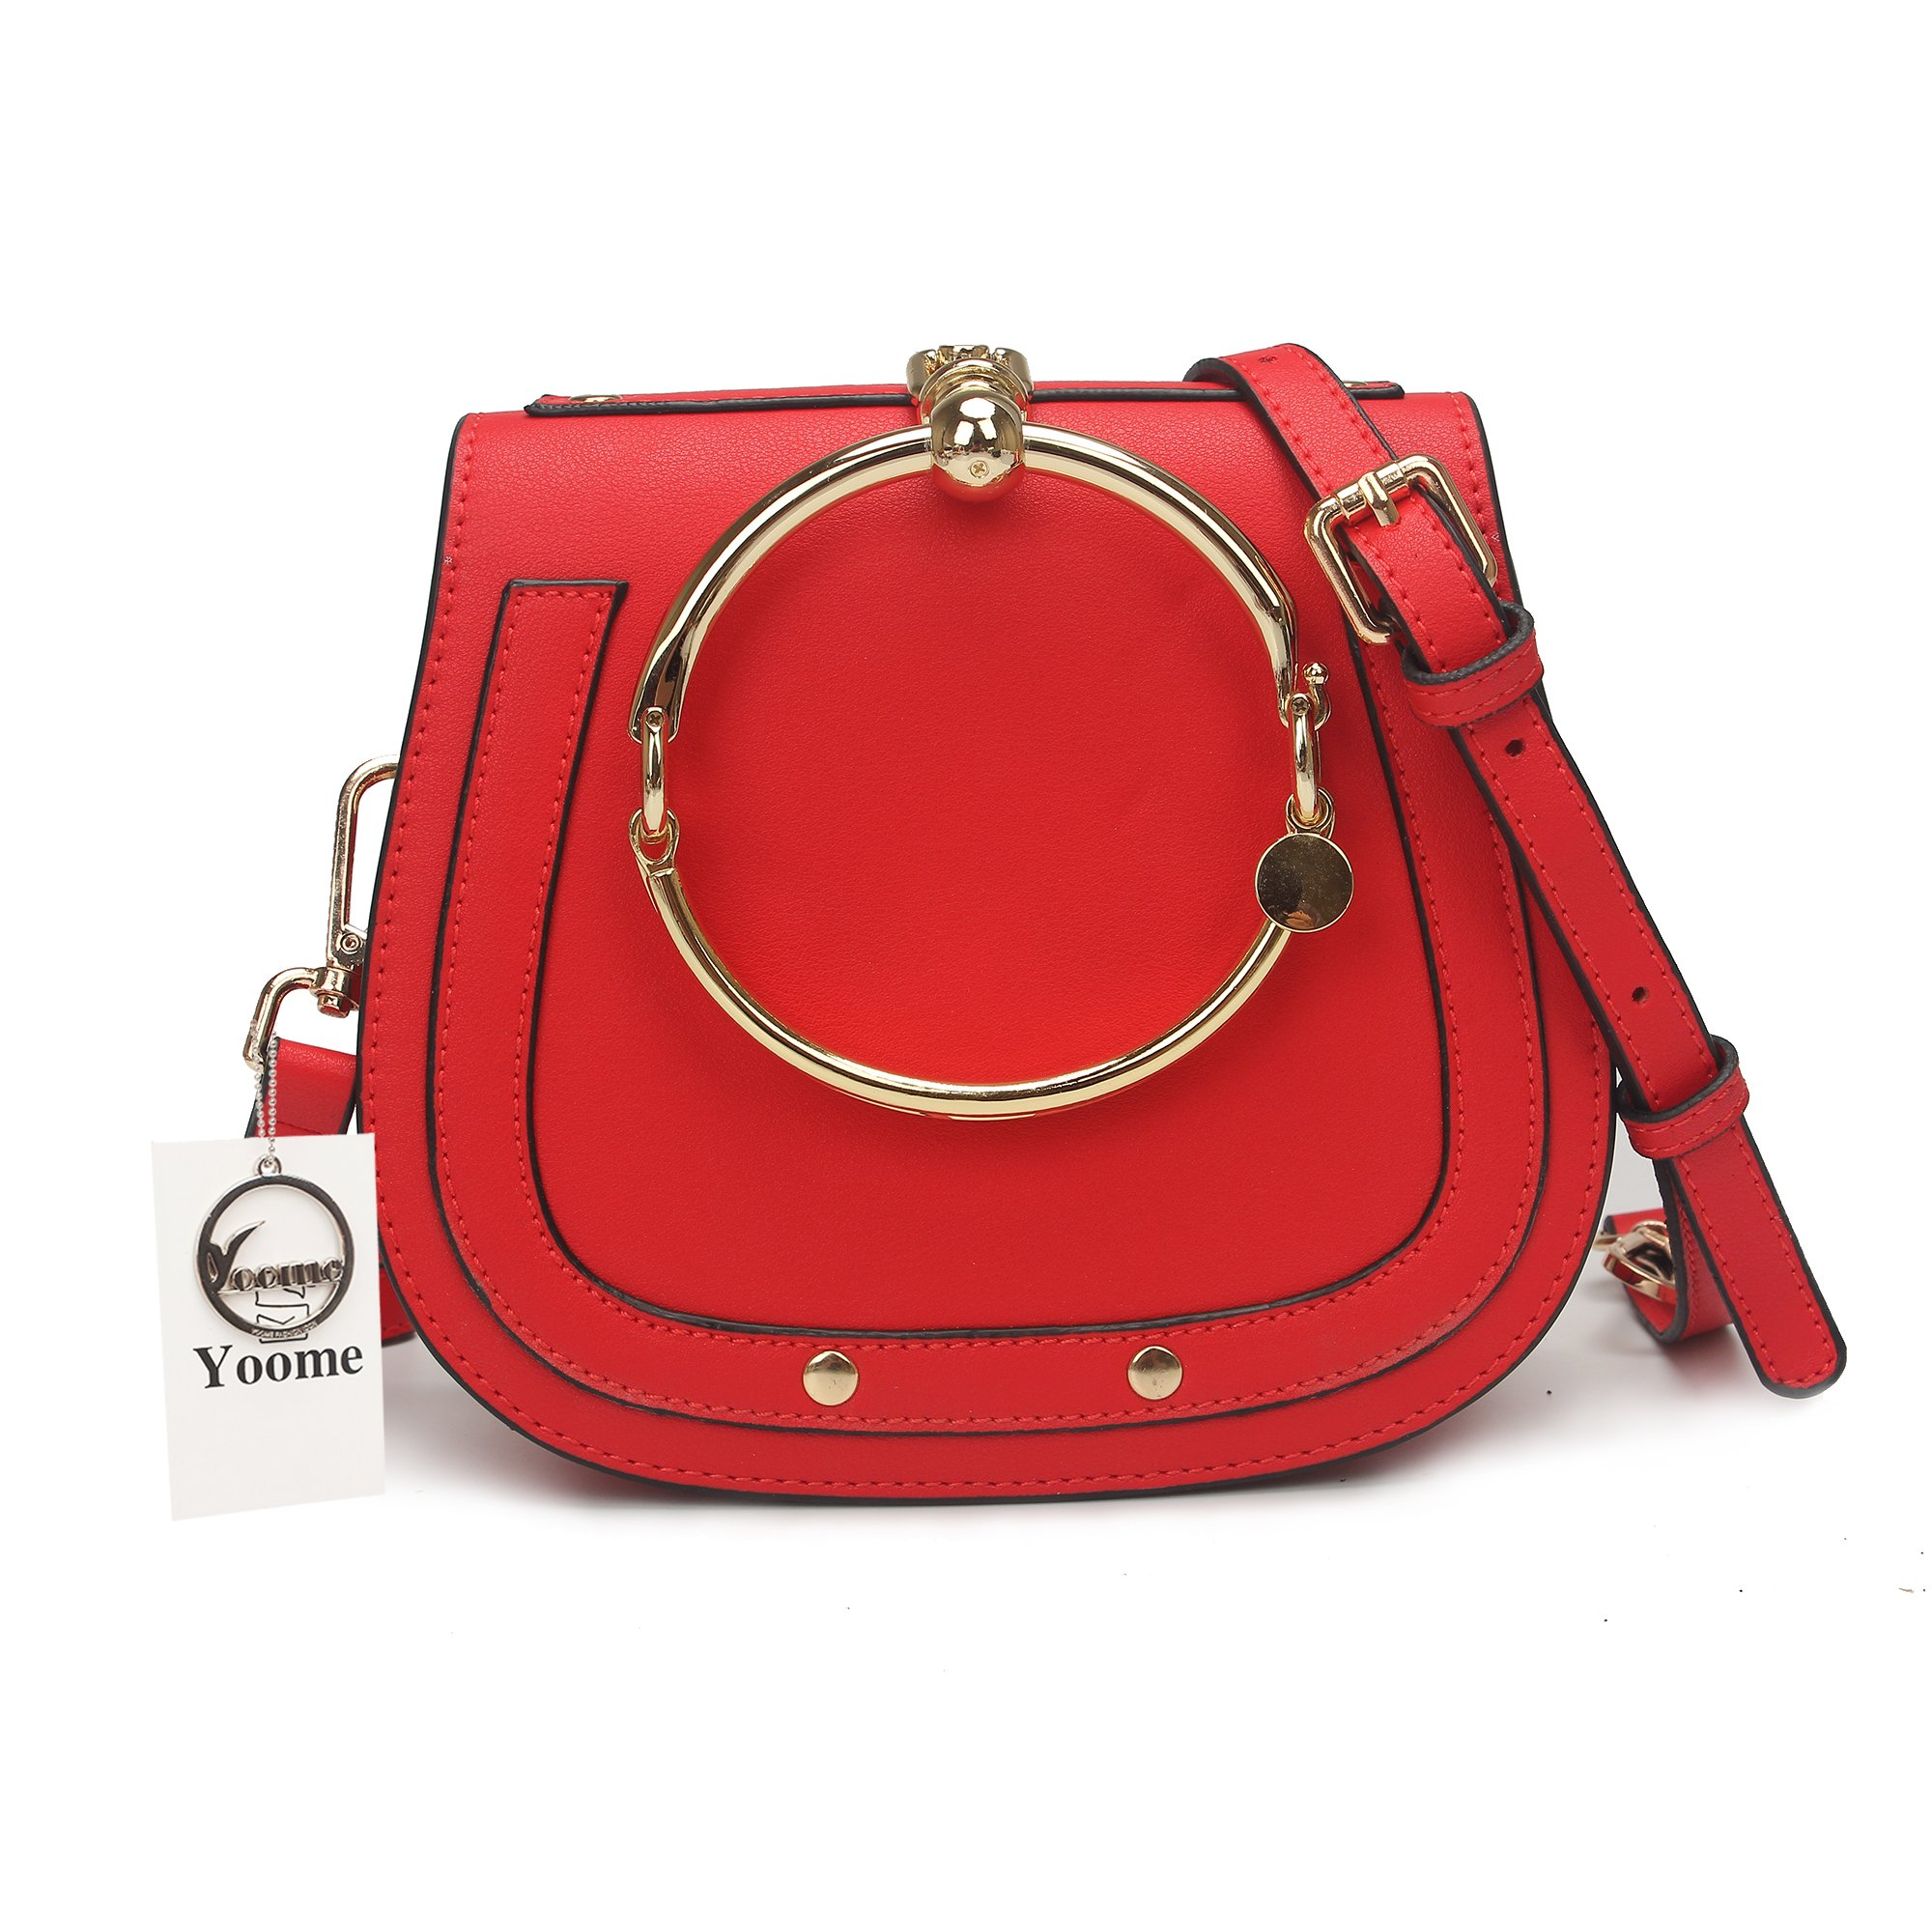 Yoome Elegant Rivets Punk Style Circular Ring Handle Handbags Messenger Crossbody Bags For Girls - Red